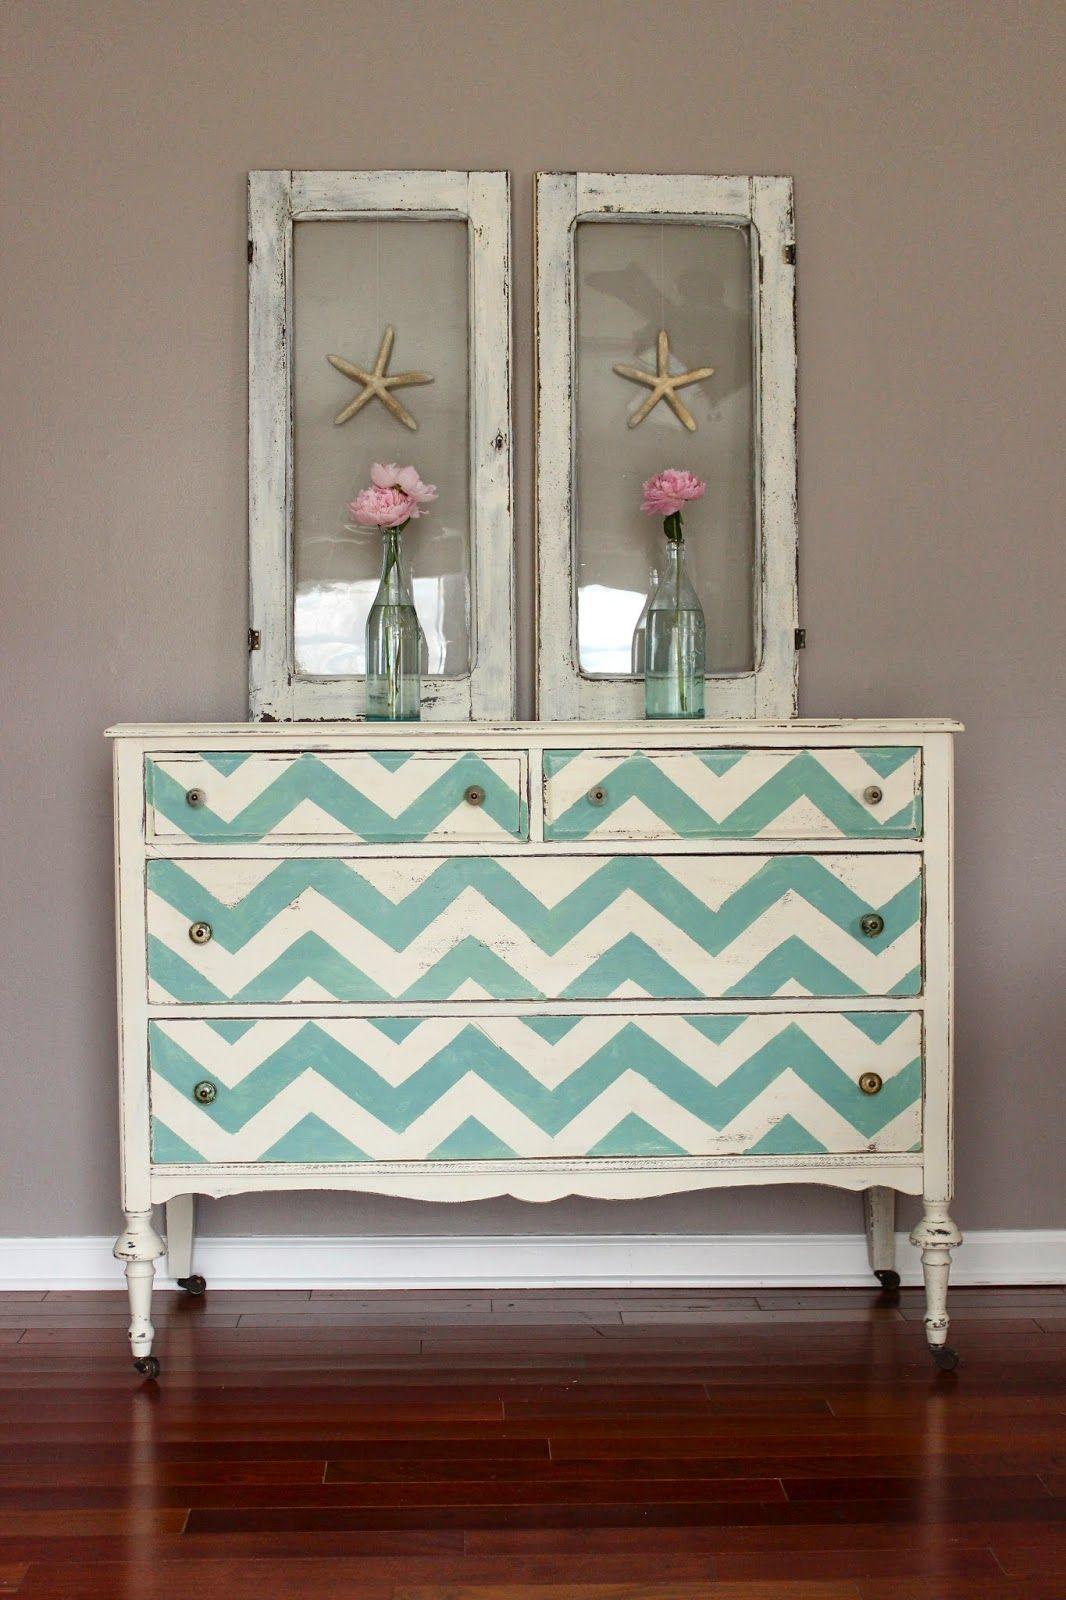 Idea para pintar mueble en color turquesa. | Casa | Pinterest ...